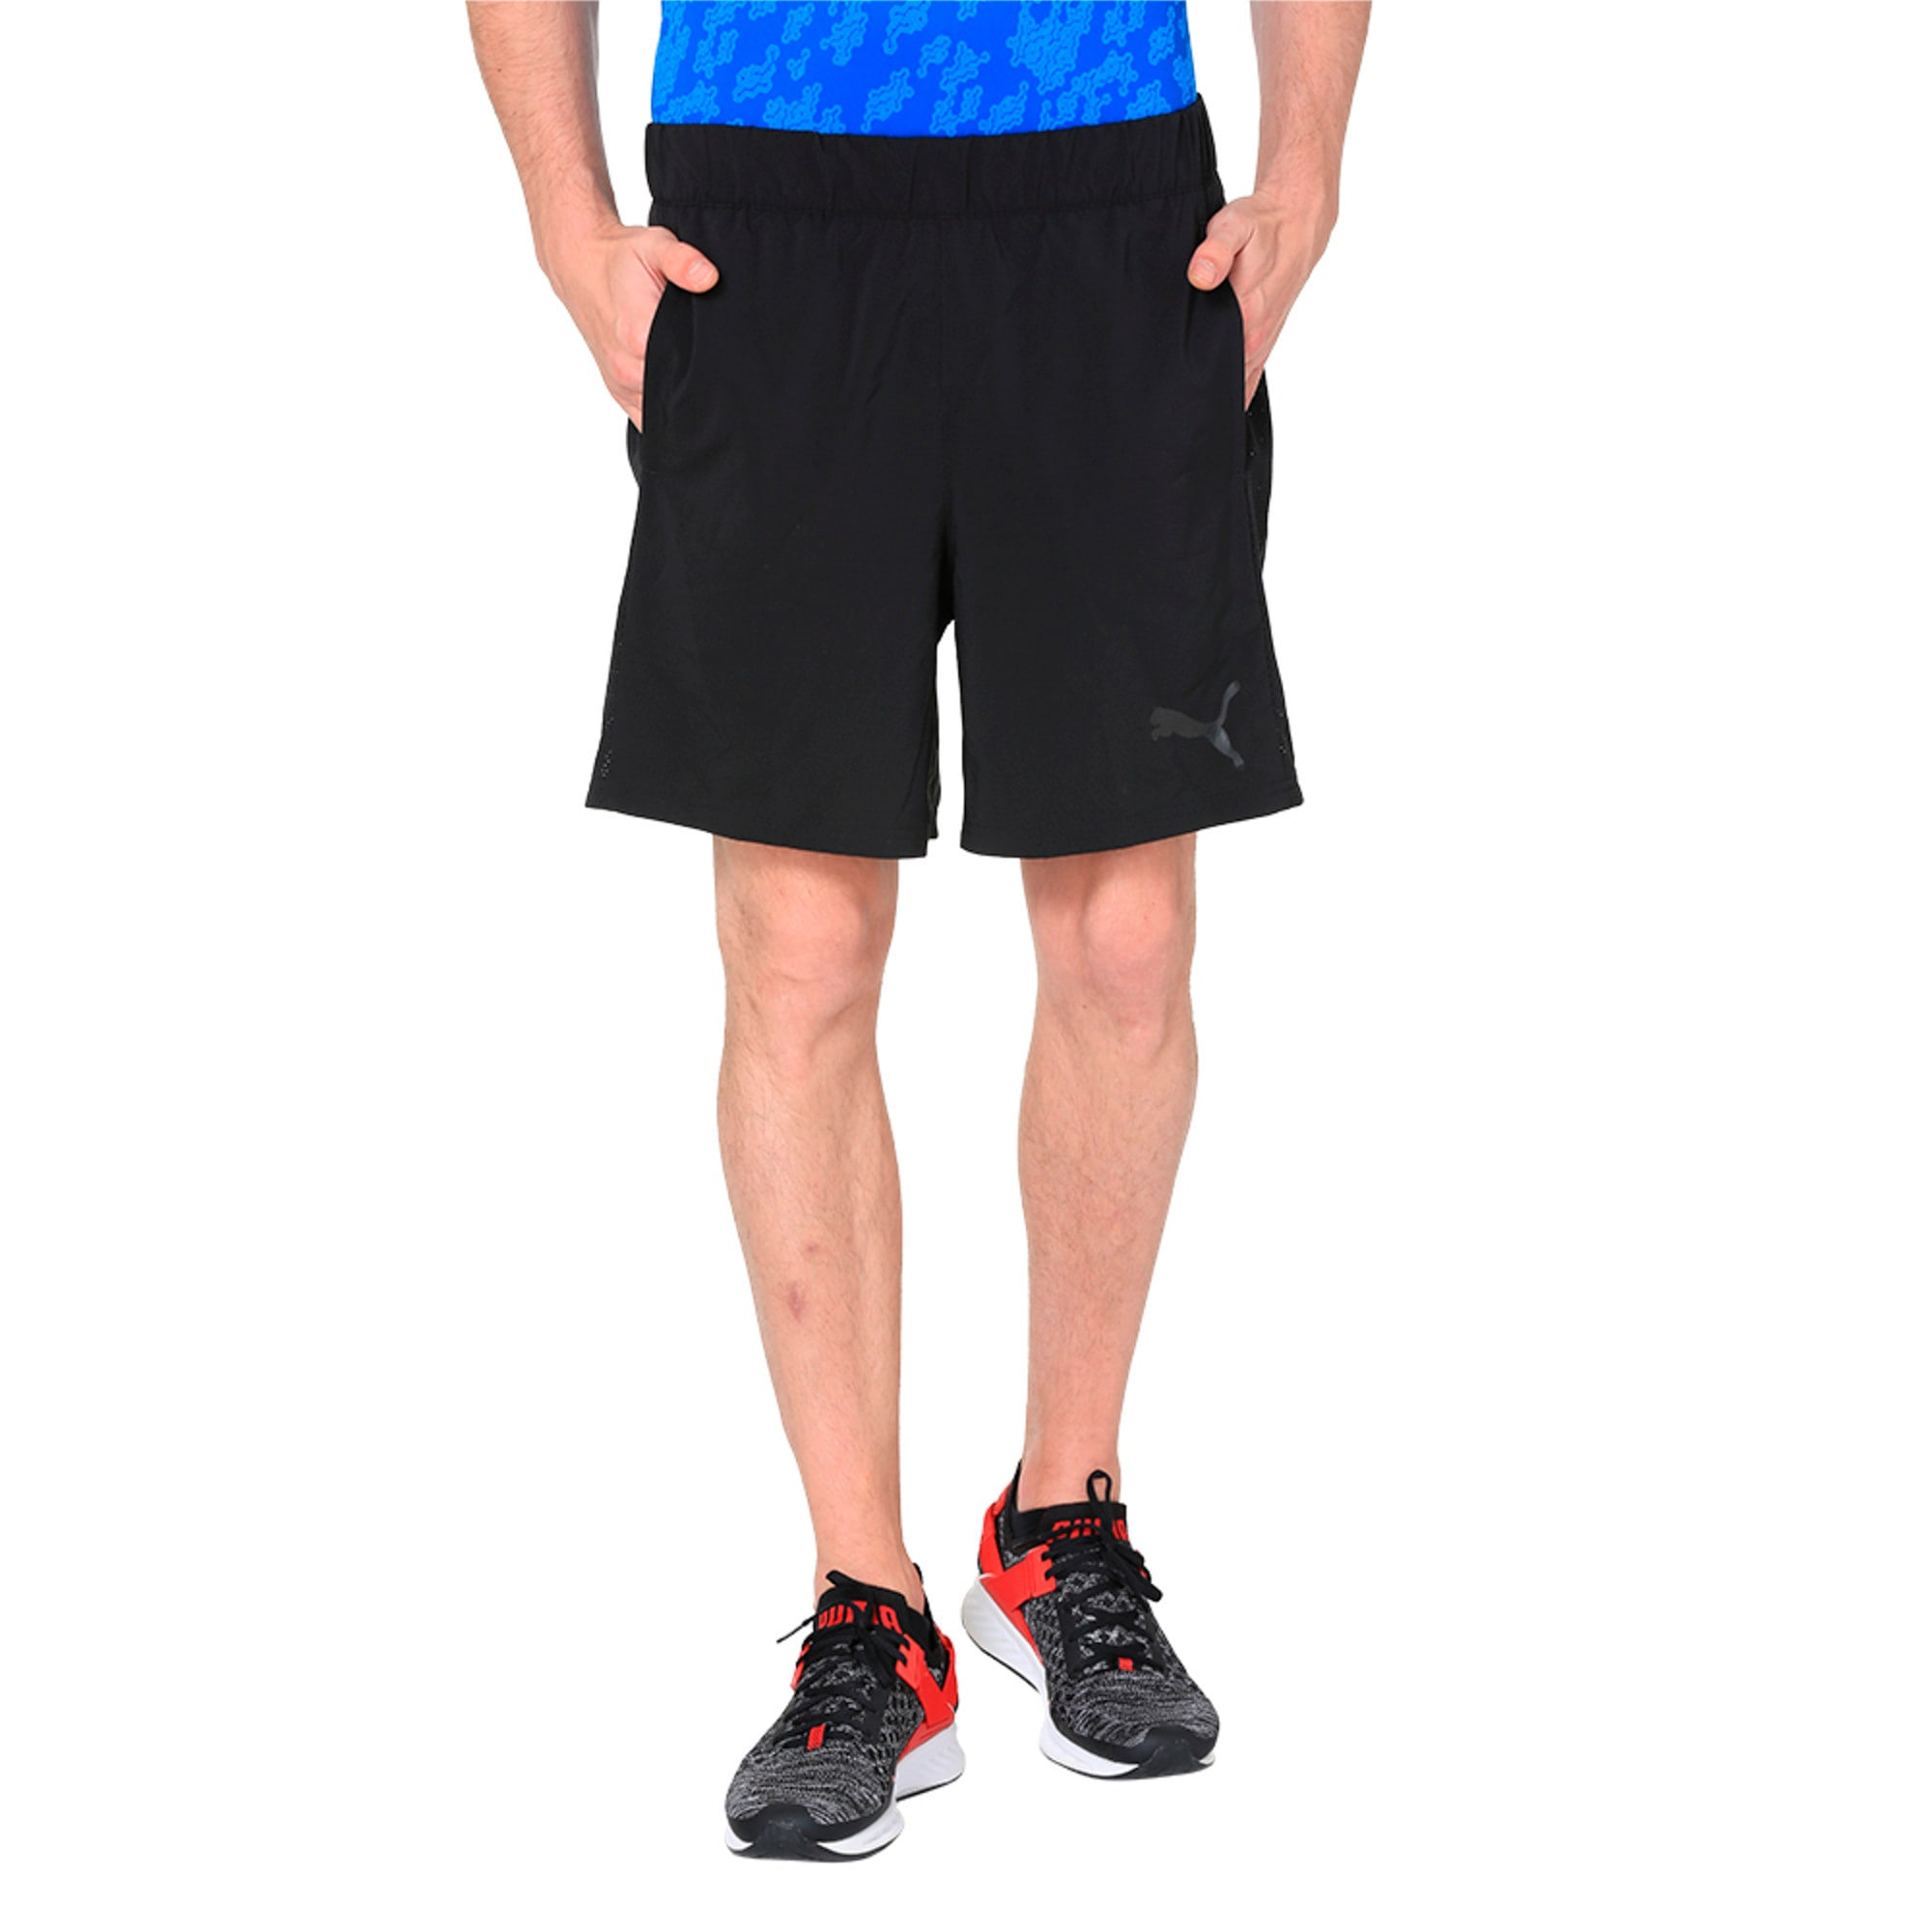 Thumbnail 2 of TECH Woven 2 in 1 Men's Training Shorts, Puma Black-Puma Black, medium-IND